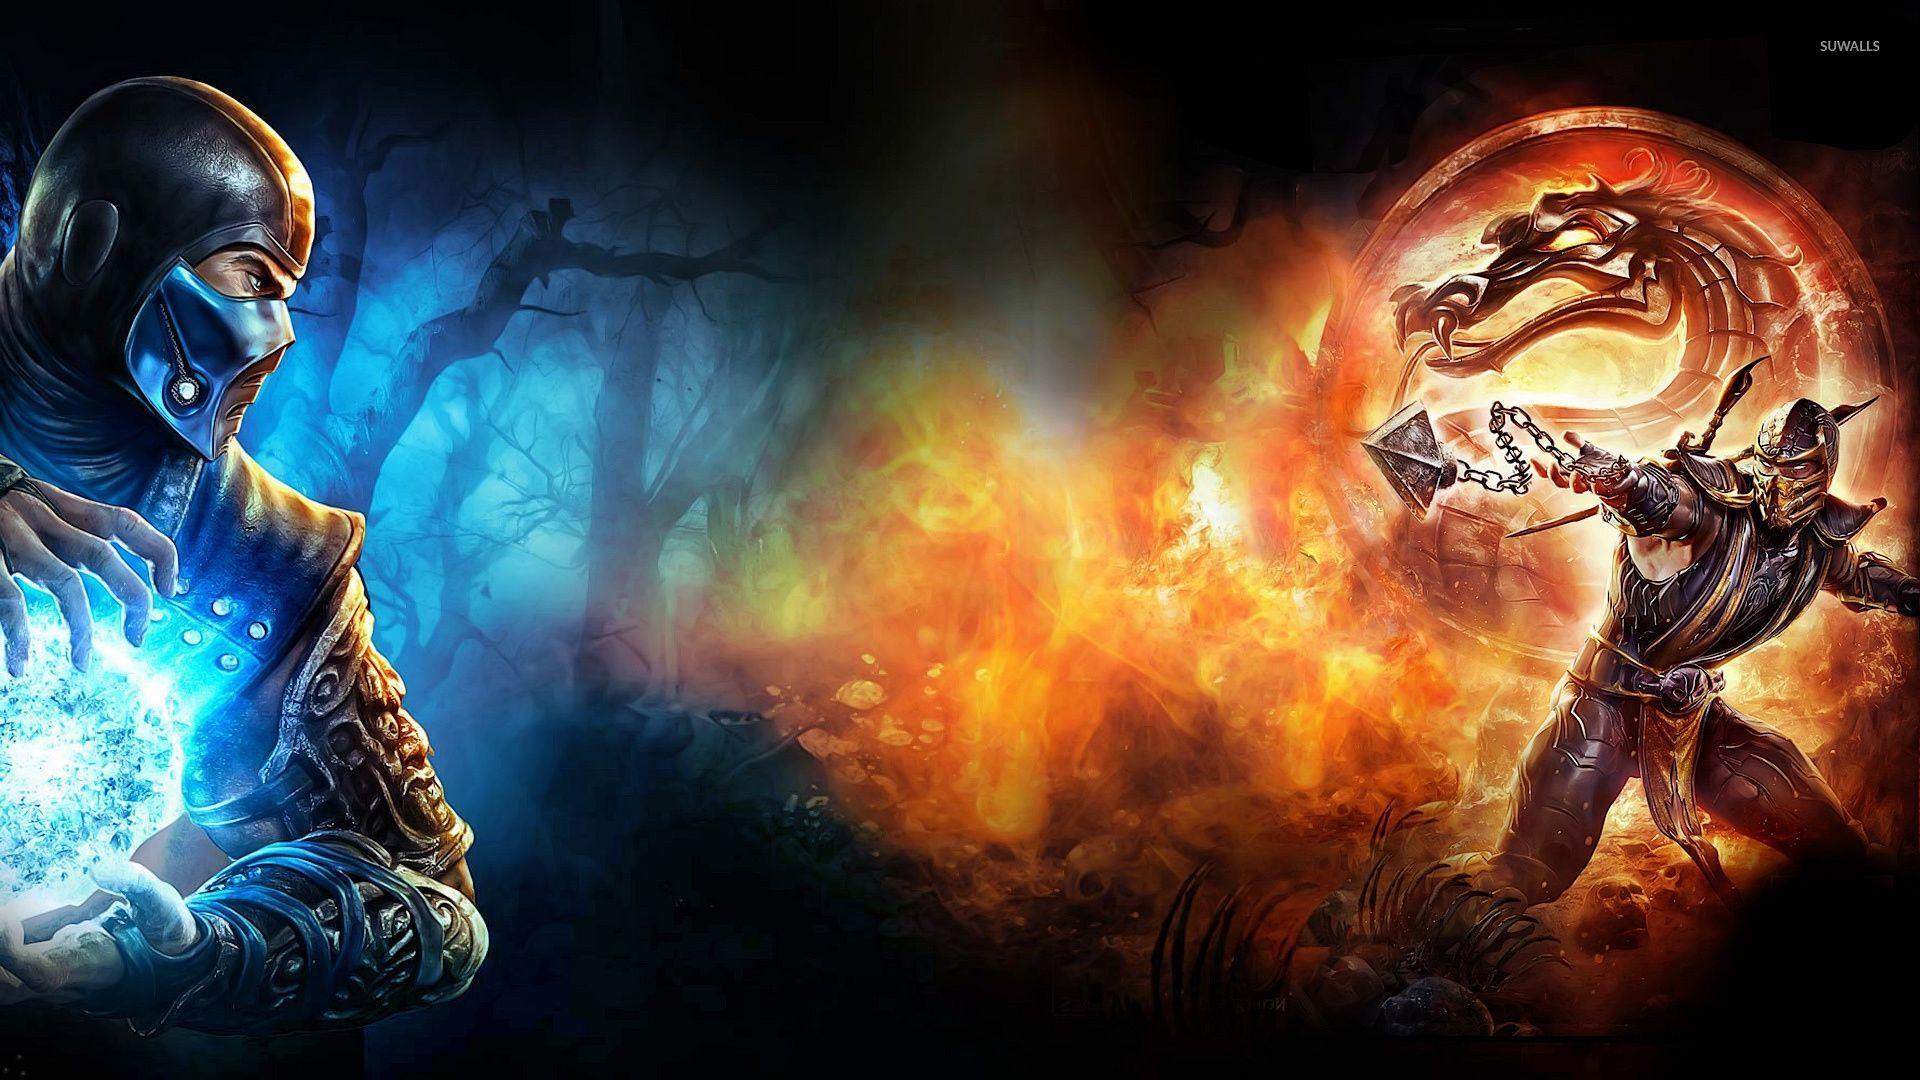 Sub Zero Vs Scorpion In Mortal Kombat X Wallpaper Mortal Kombat